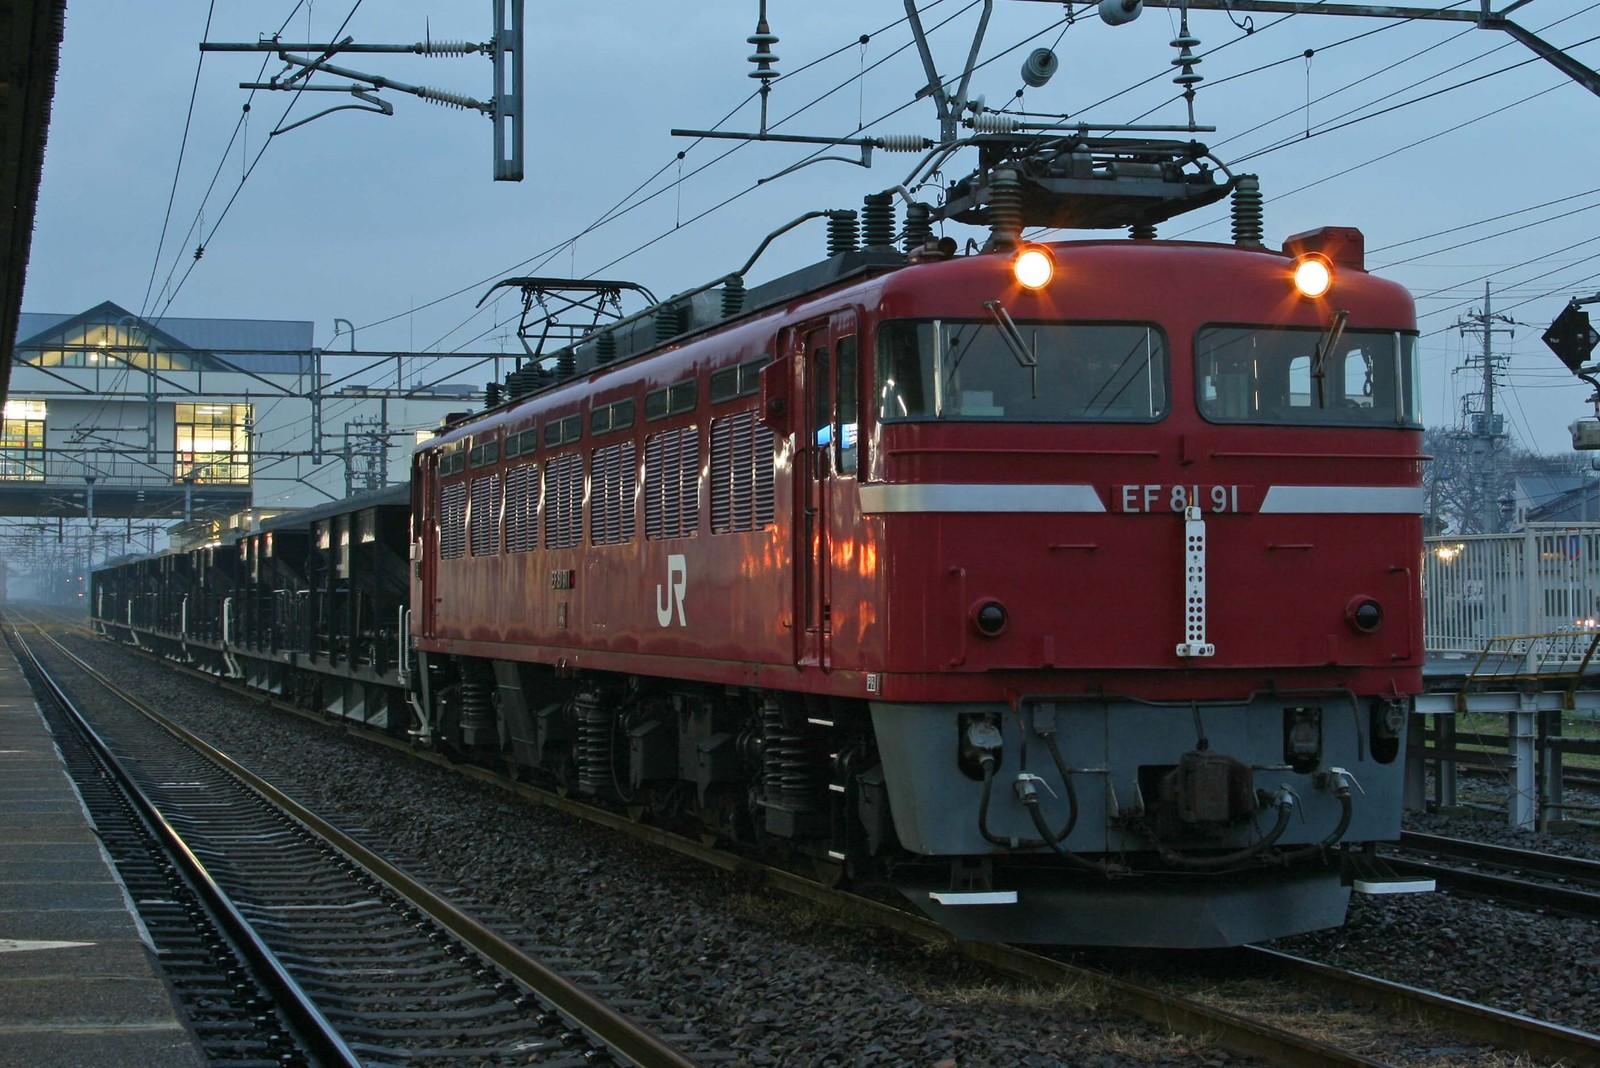 Ef8191